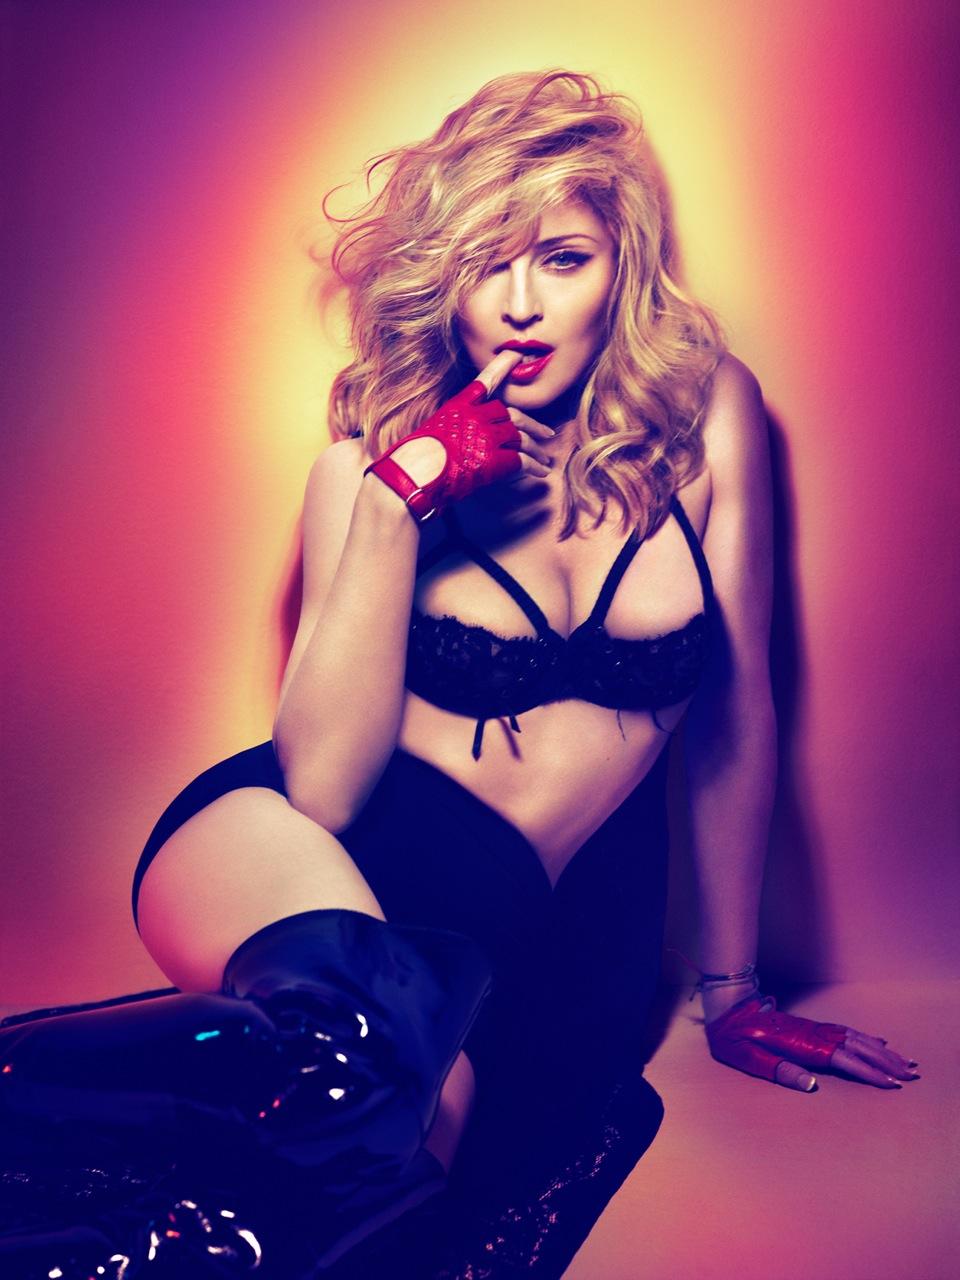 Madonna Promo Photo Courtesy Of Universal/Interscope